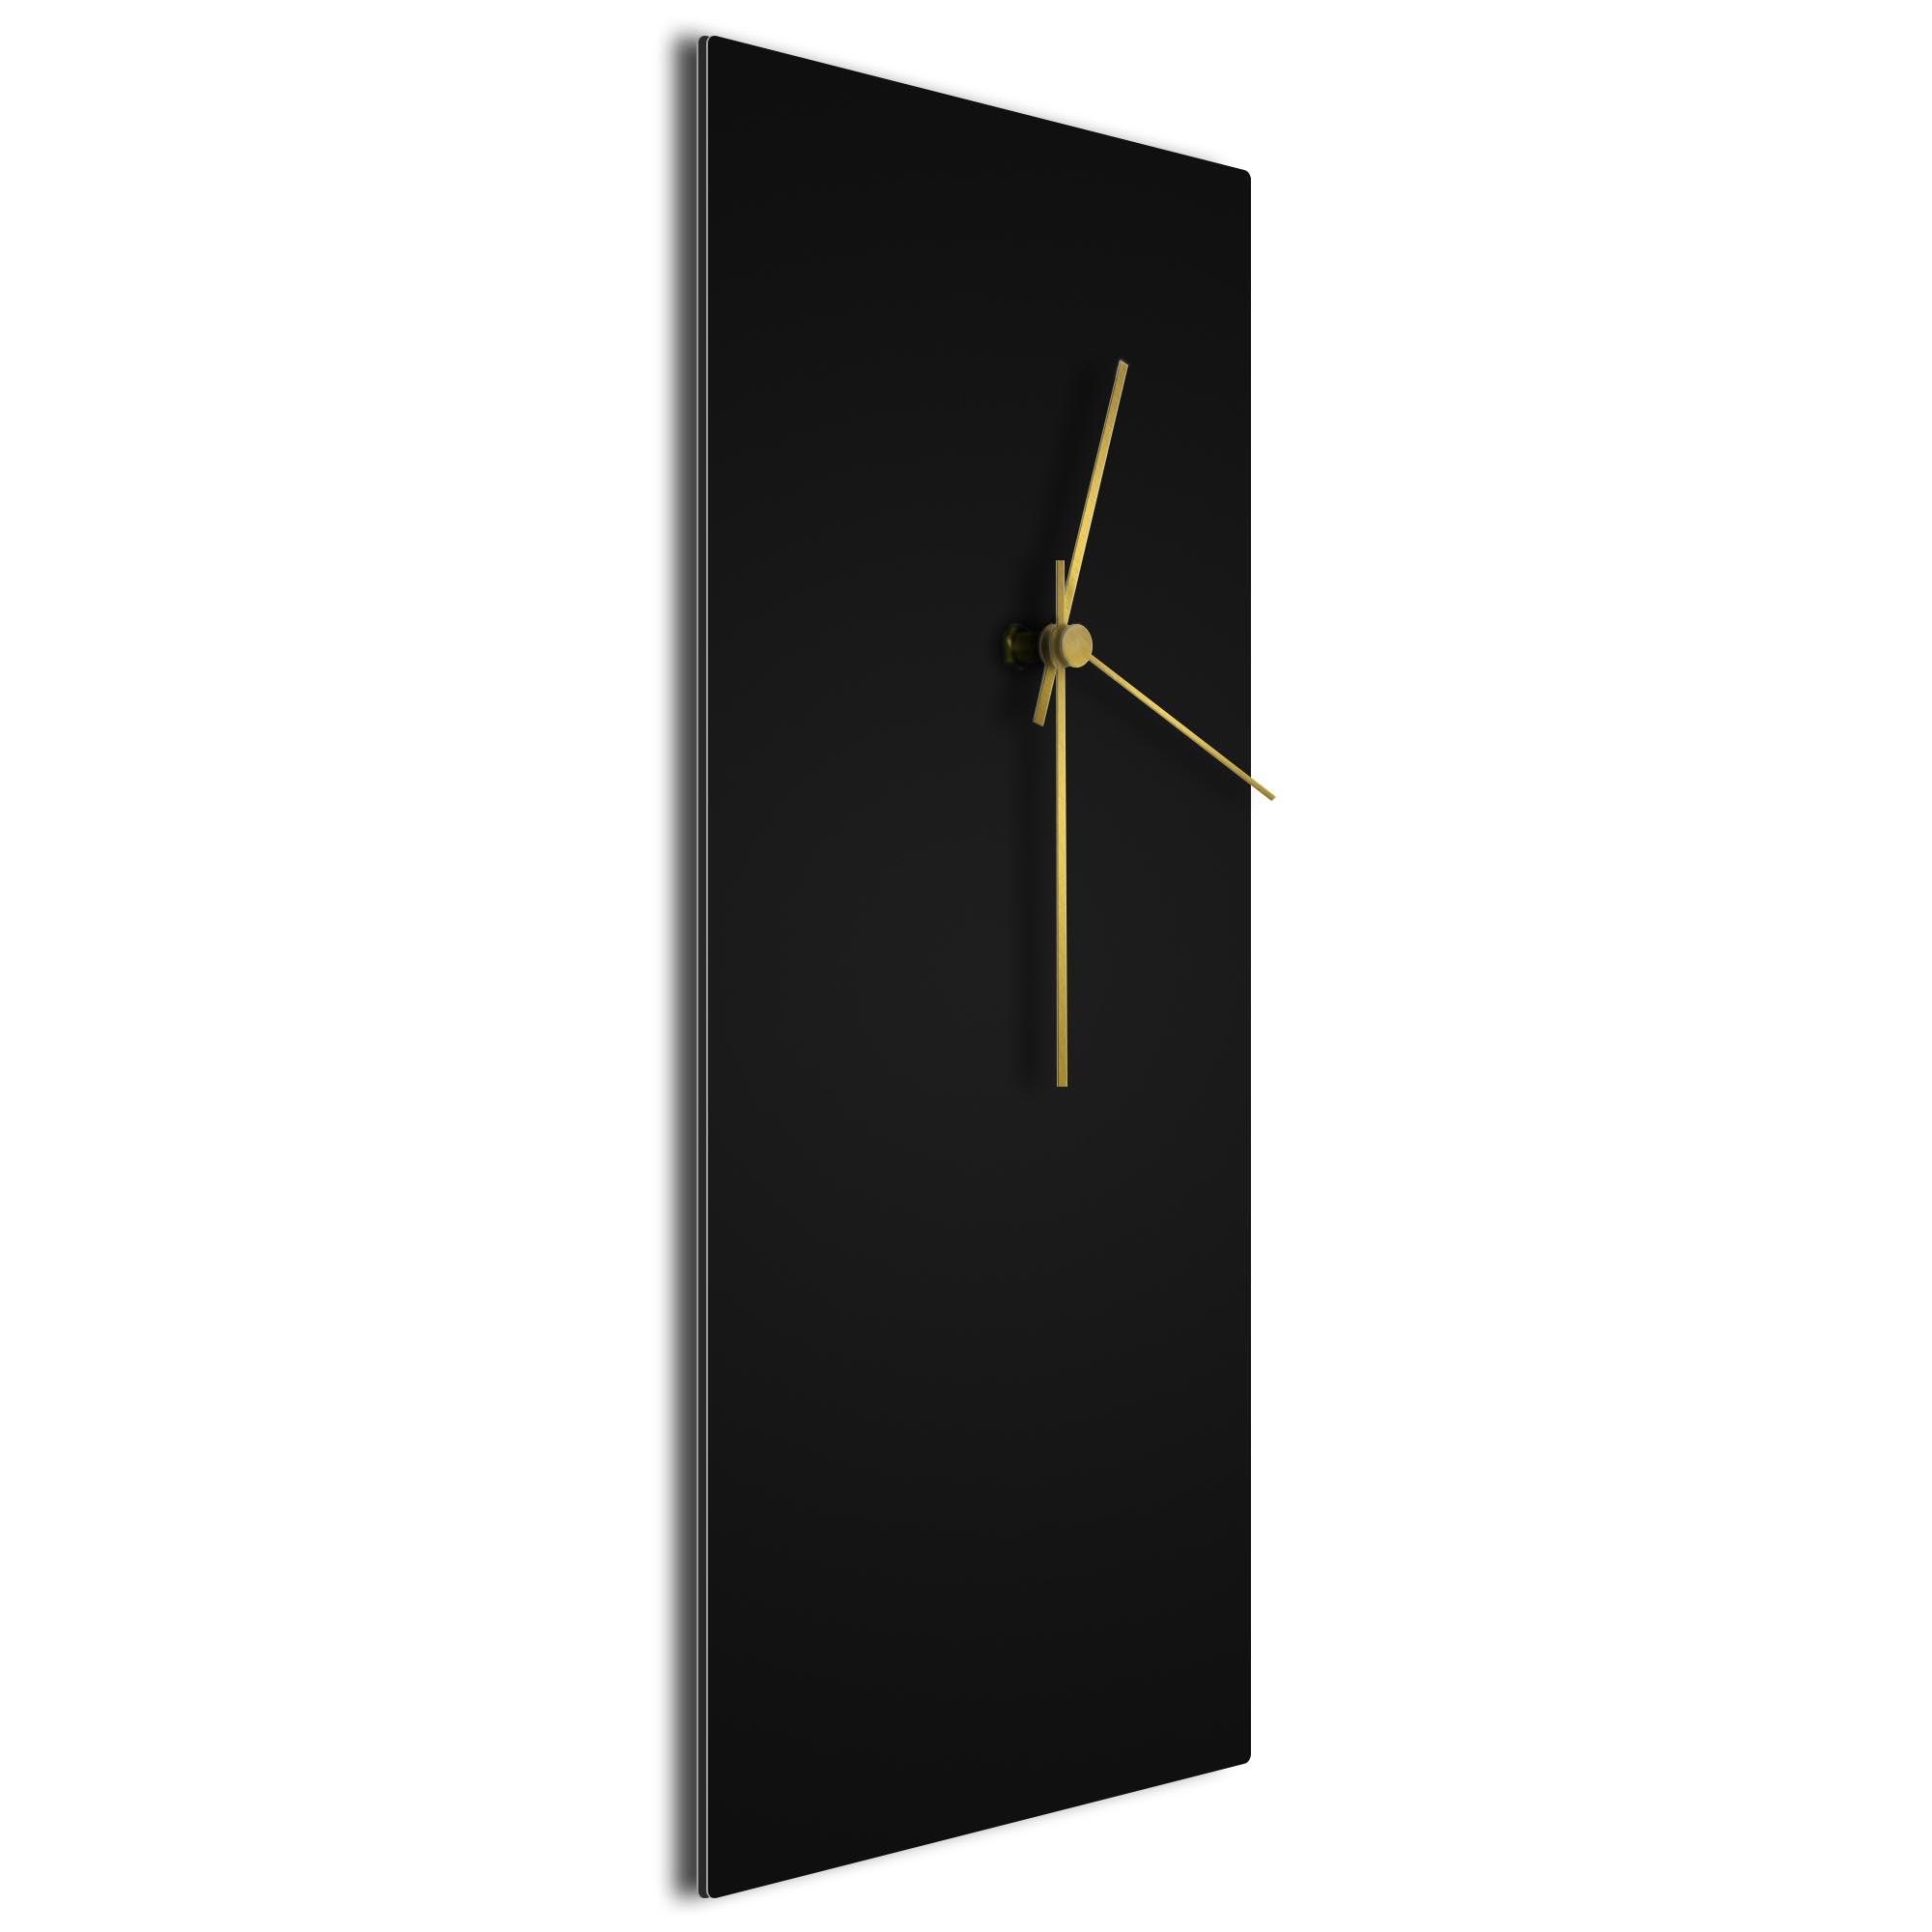 Blackout Gold Clock Large - Image 2